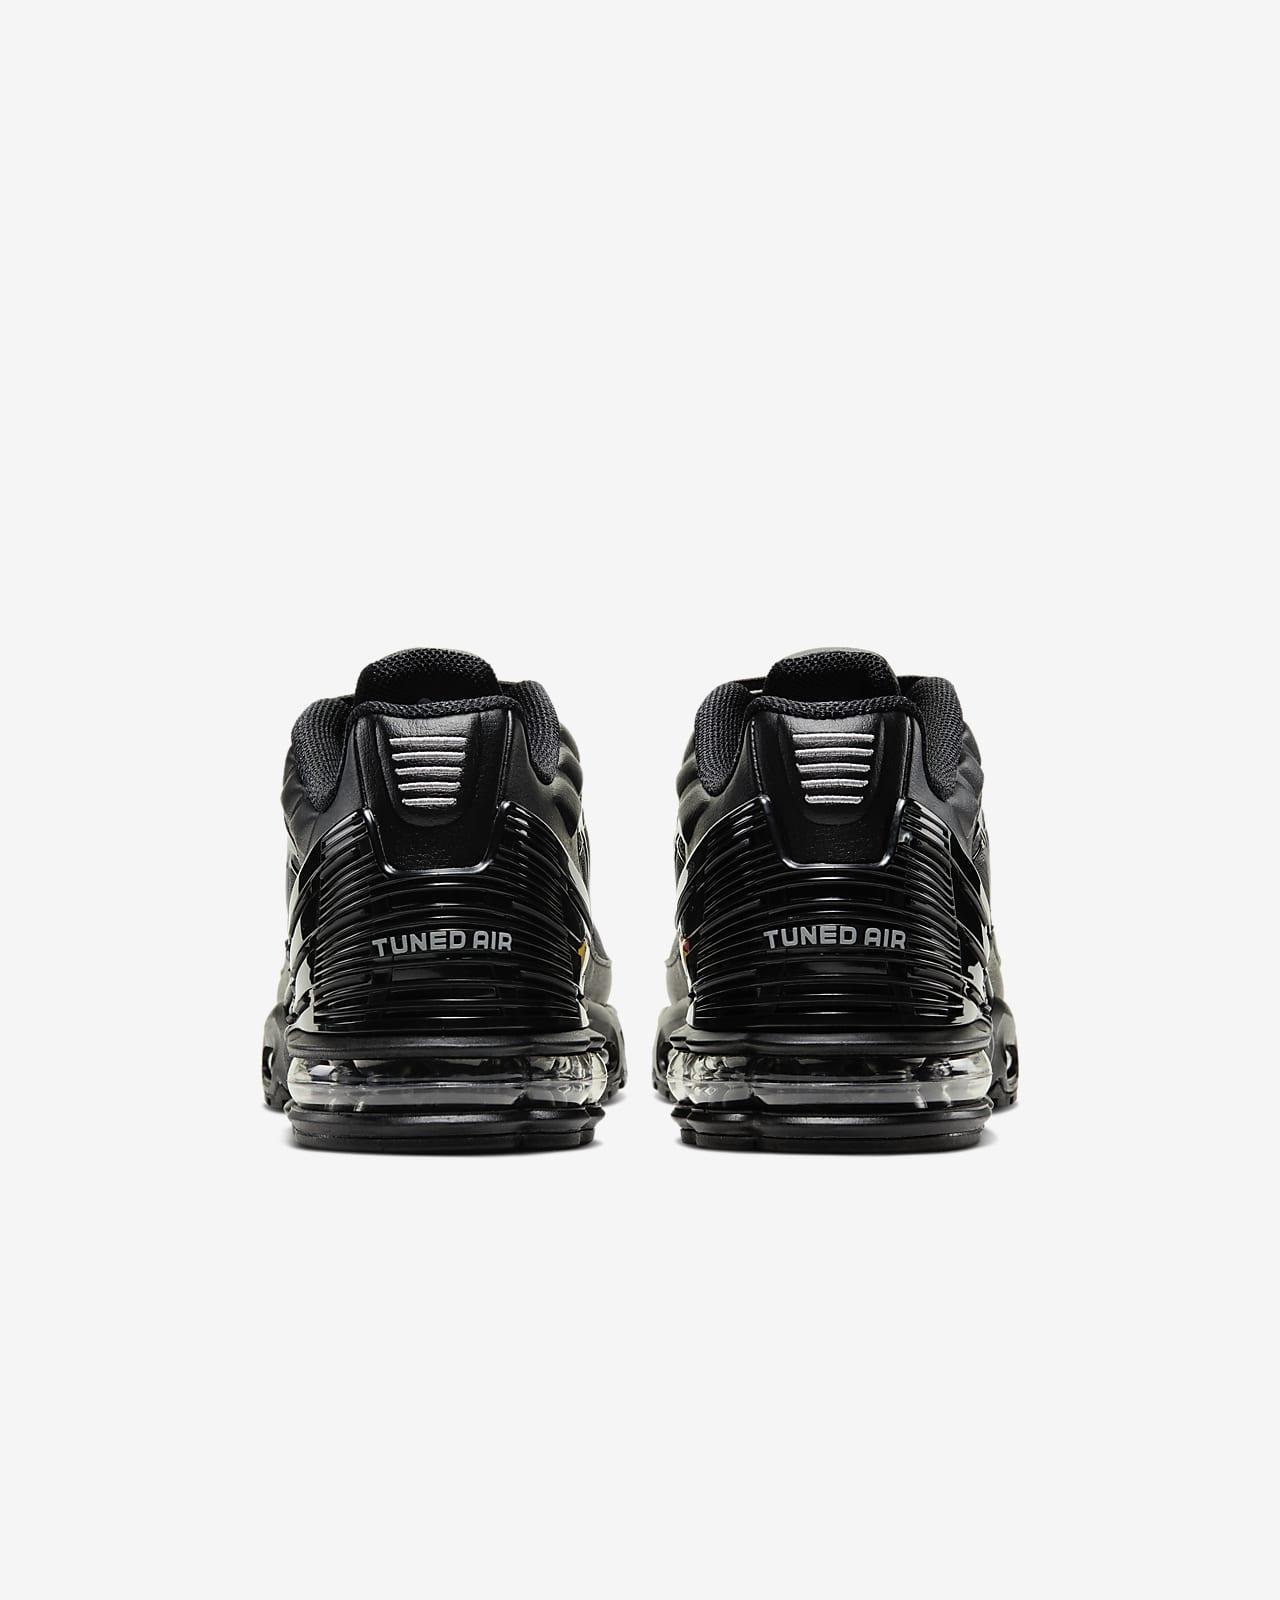 Nike Air Max Plus III Men's Shoes